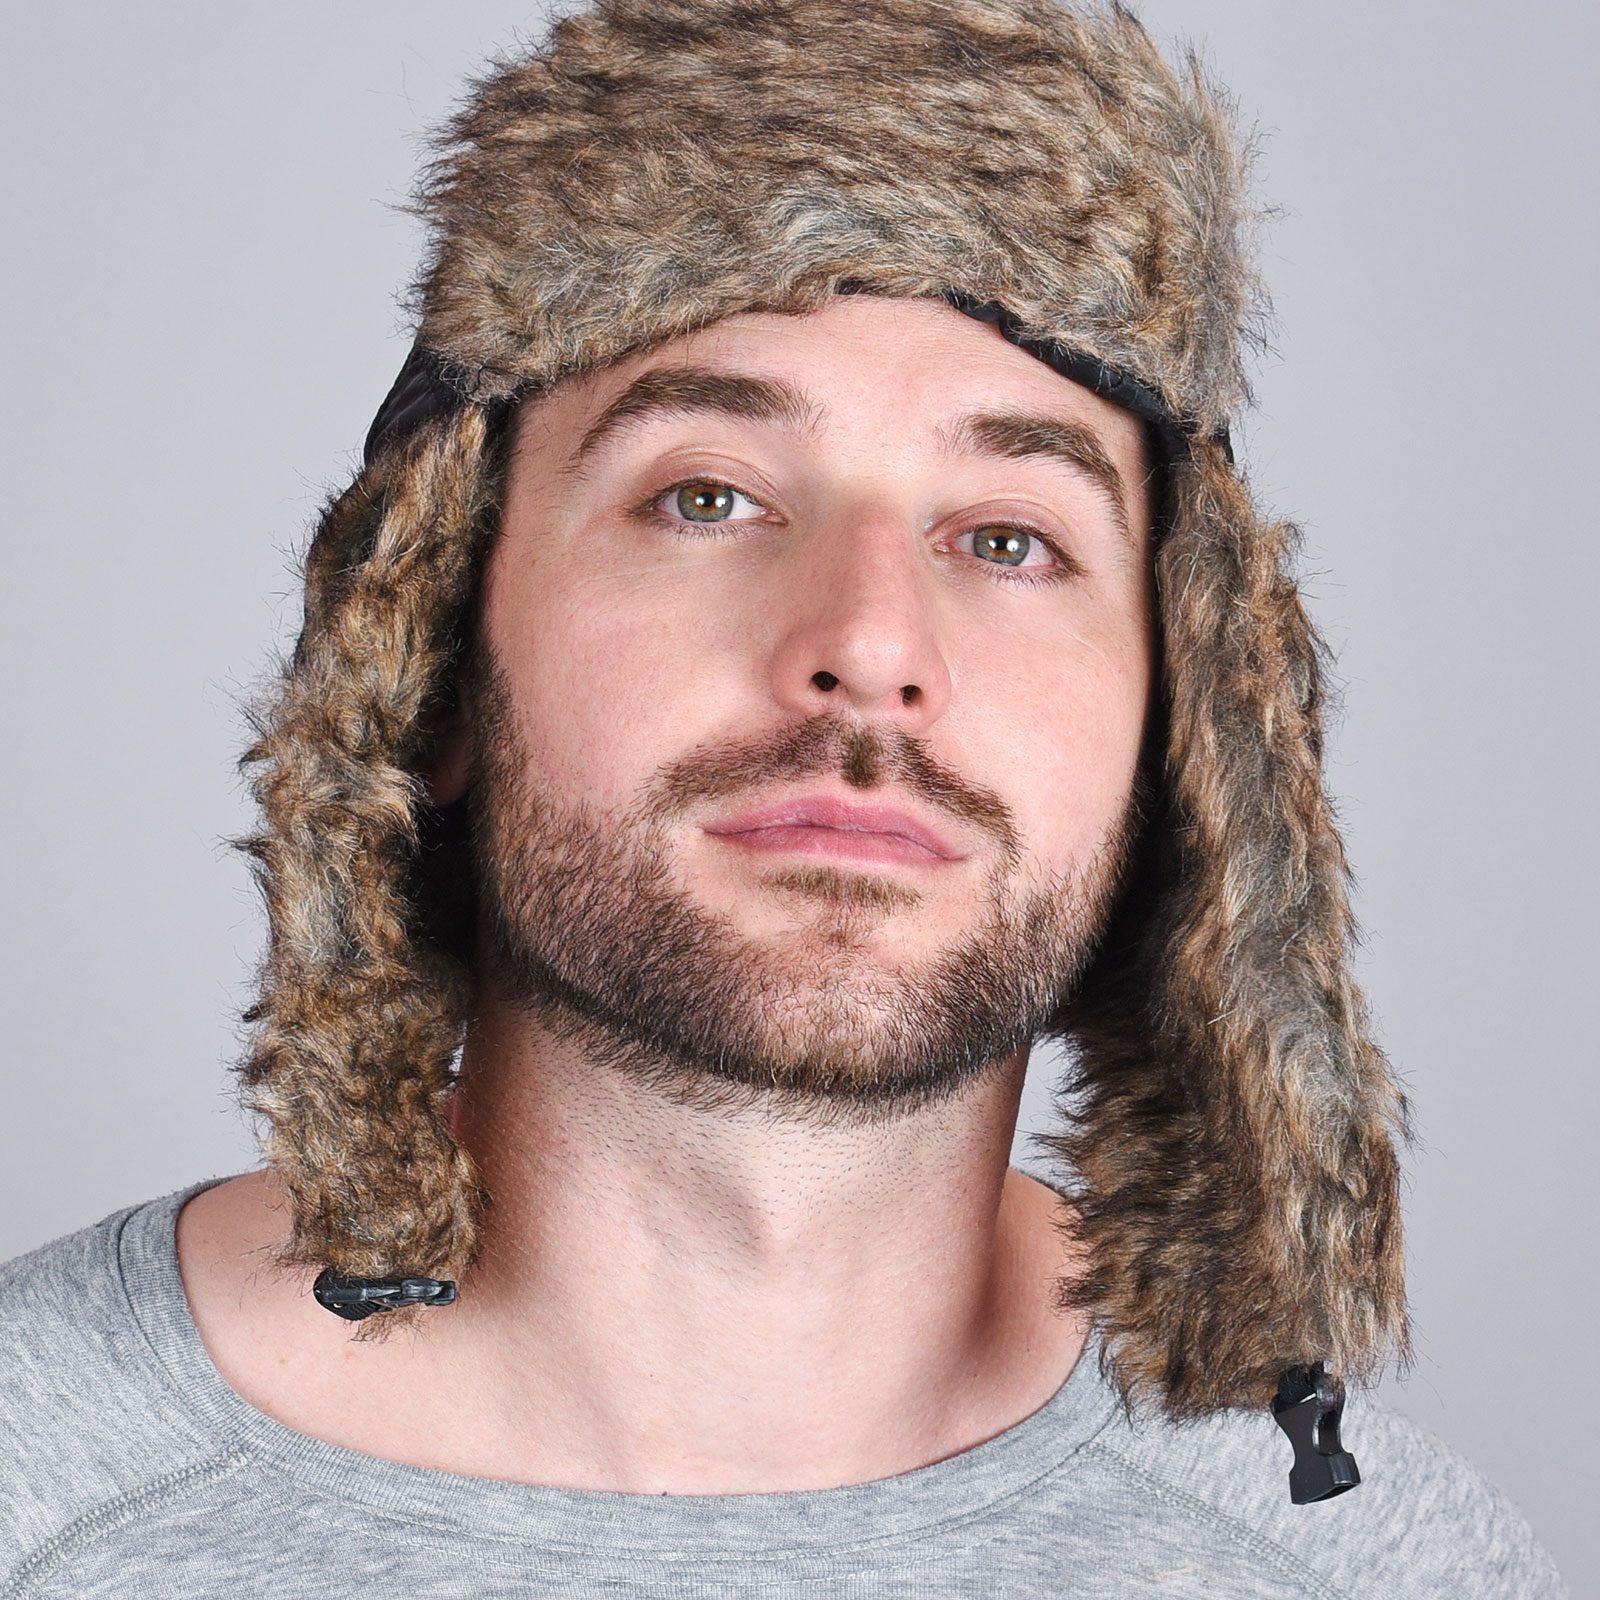 http://lookbook.allee-du-foulard.fr/wp-content/uploads/2018/11/CP-00137-VH16-2-chapka-homme-noire-1600x1600.jpg